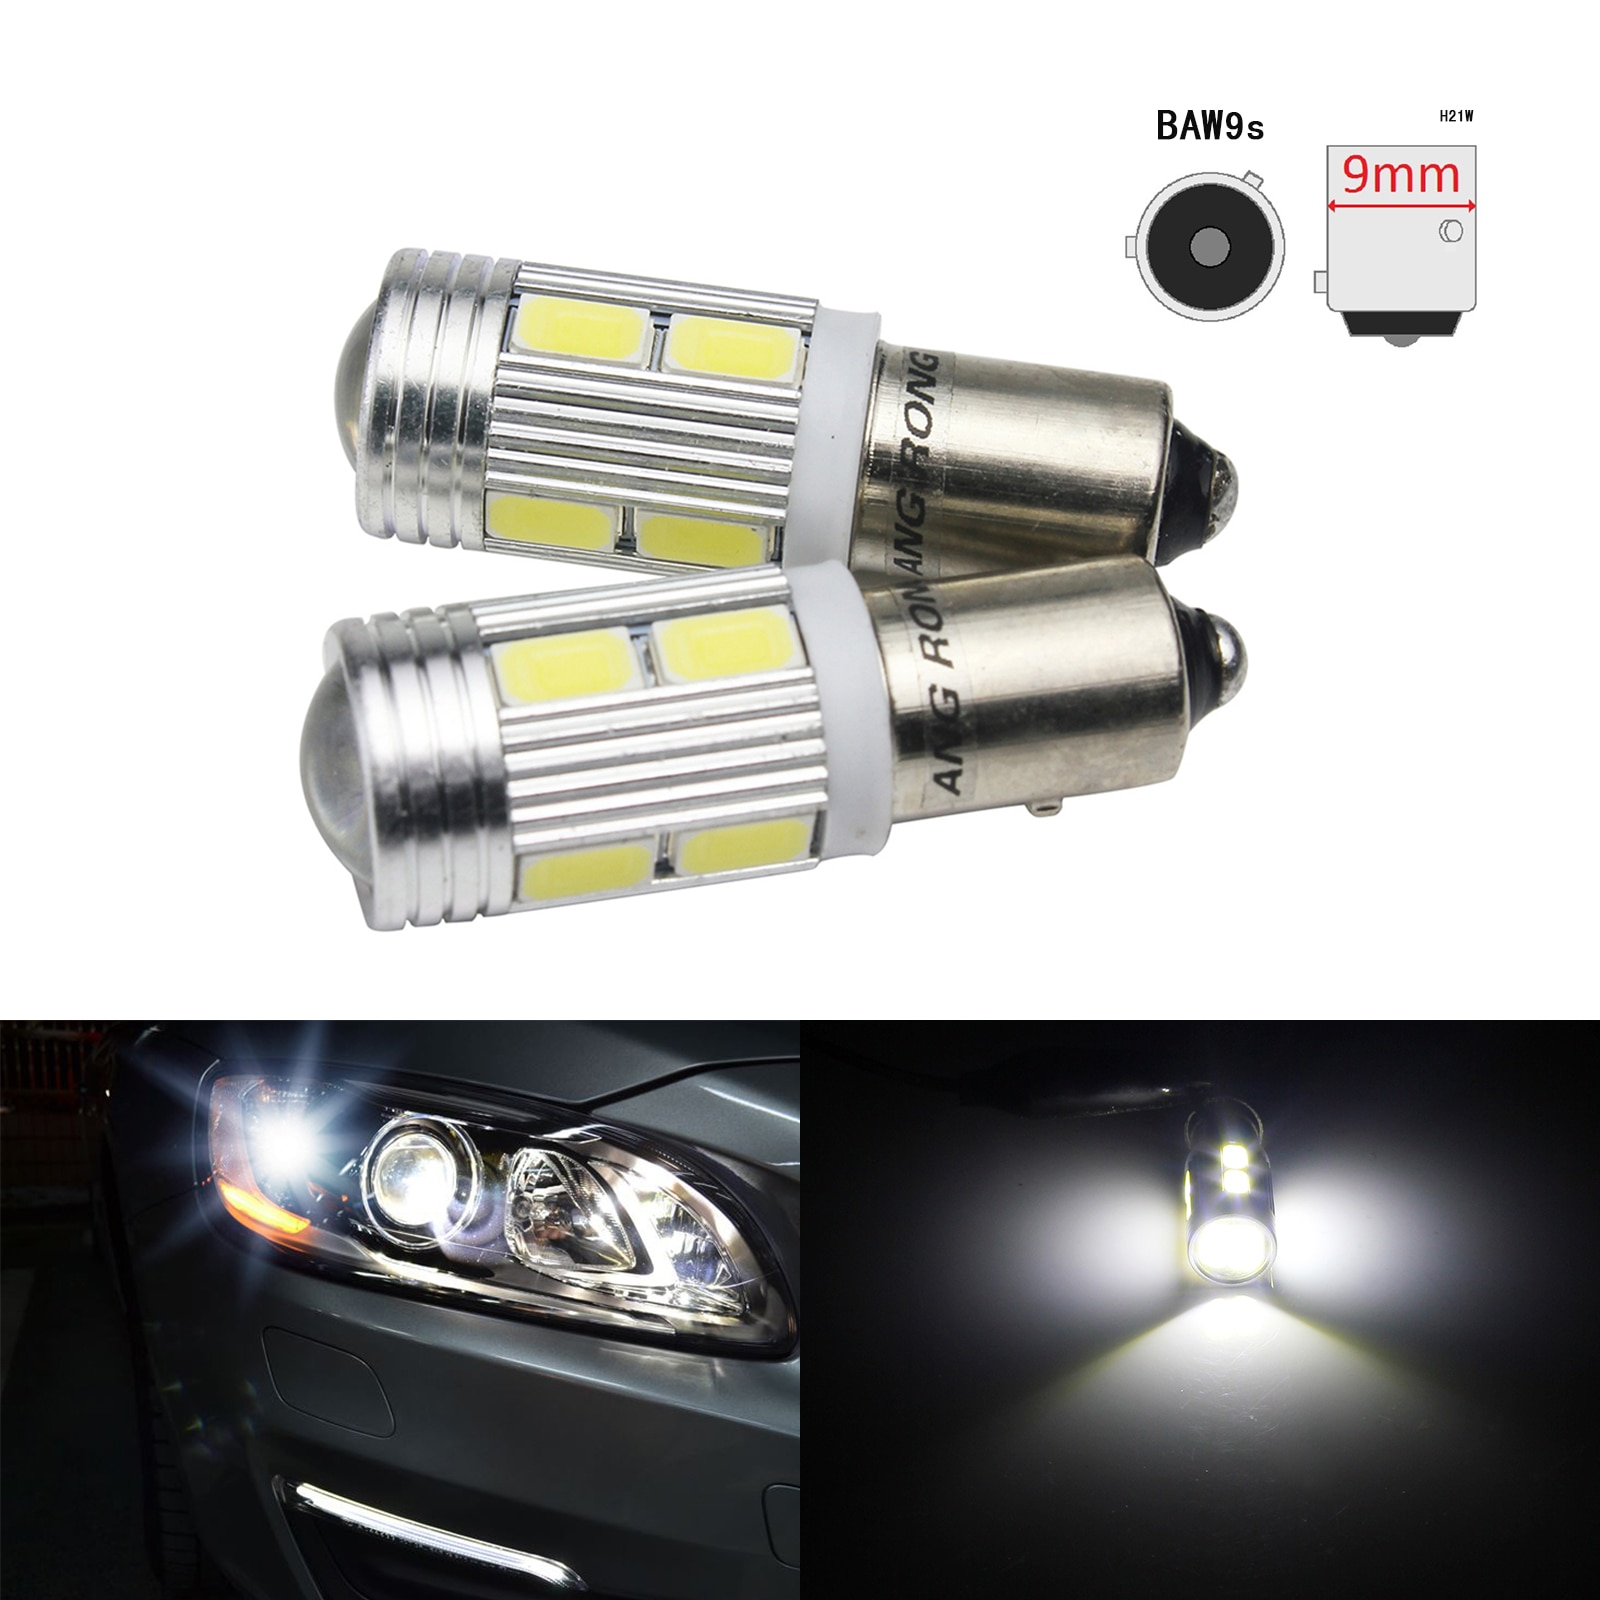 ANGRONG 2x Белый BAW9s HY21W 4 Вт светодиодный индикатор Sidelight лампа для парковки